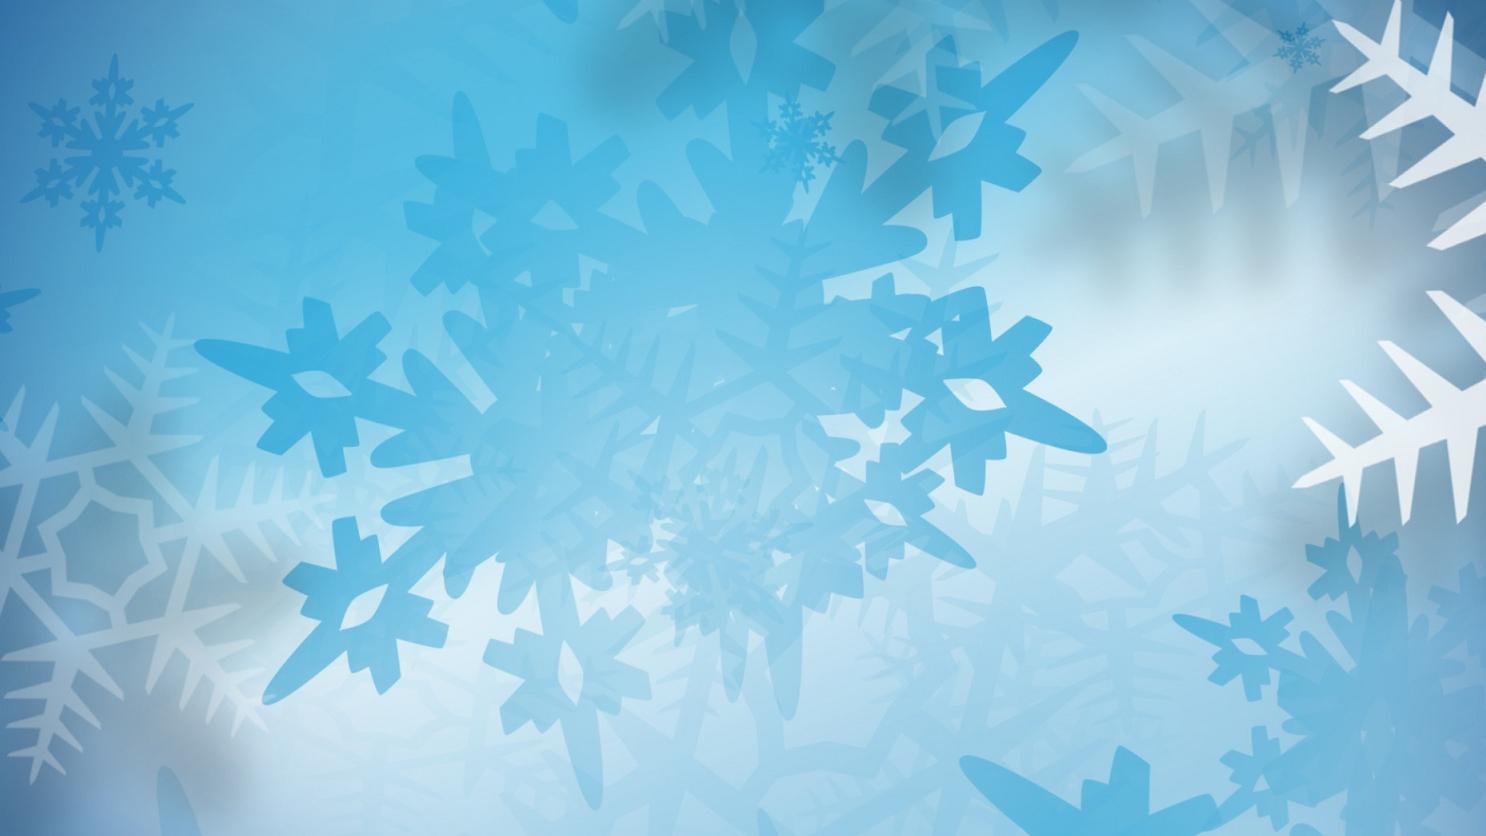 KELO snow snowflakes generic